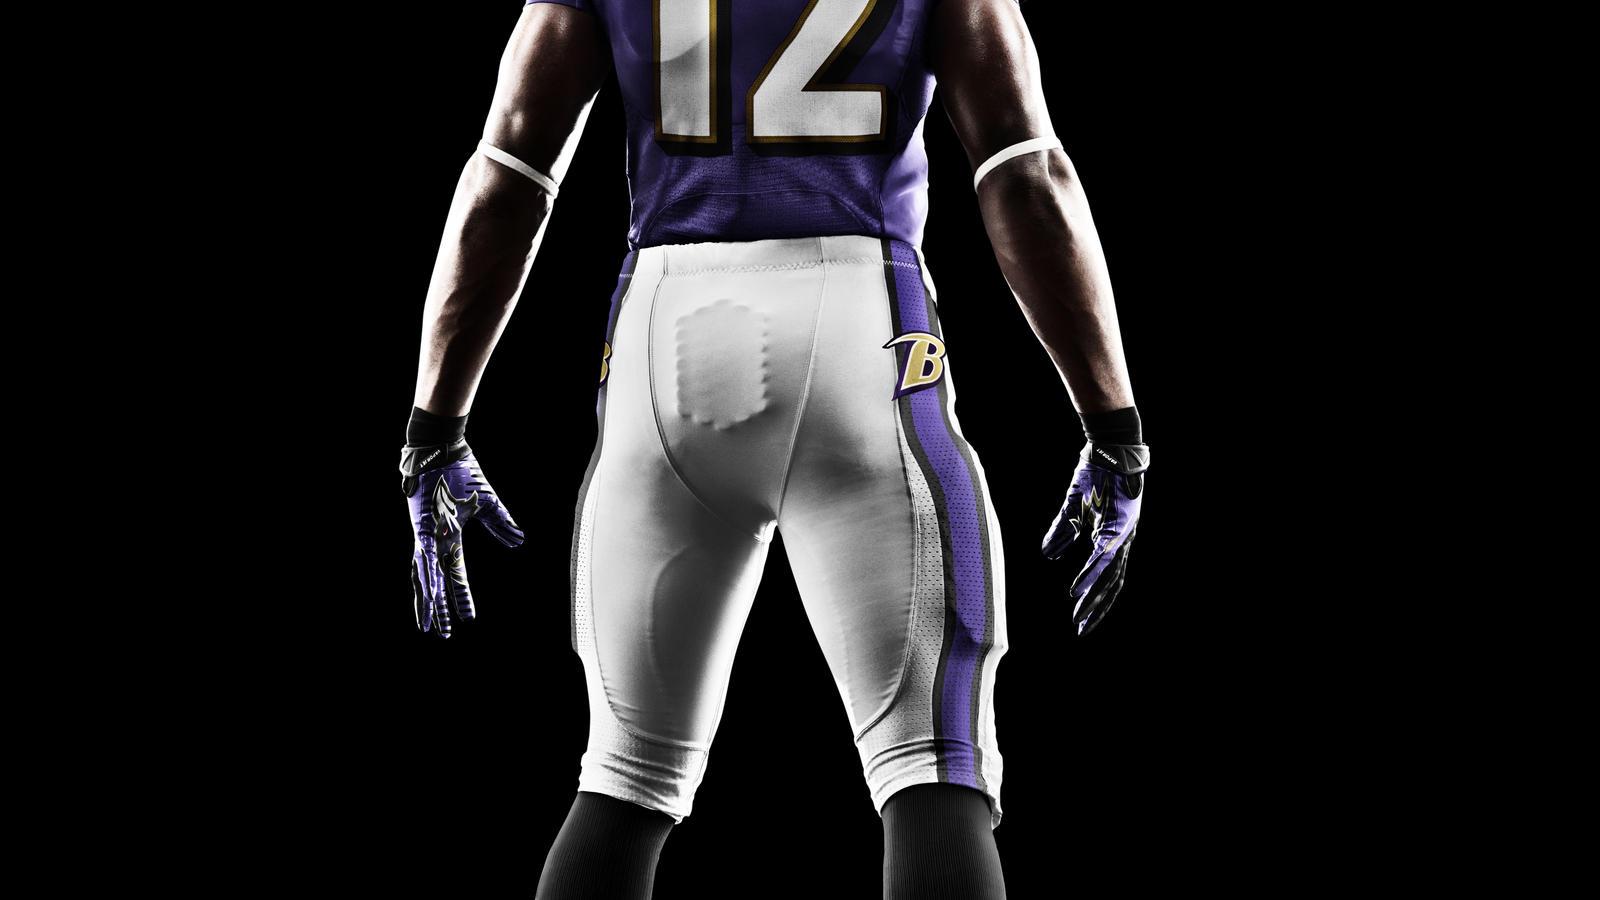 246c9ff64f5 SU12_AT_NFL_UNIFORM_BACK_RAVENS. SU12_AT_NFL_UNIFORM_D-RING_BELT_RAVENS.  SU12_AT_NFL_UNIFORM_DEFLEX_RAVENS. SU12_AT_NFL_UNIFORM_FLYWIRE_RAVENS